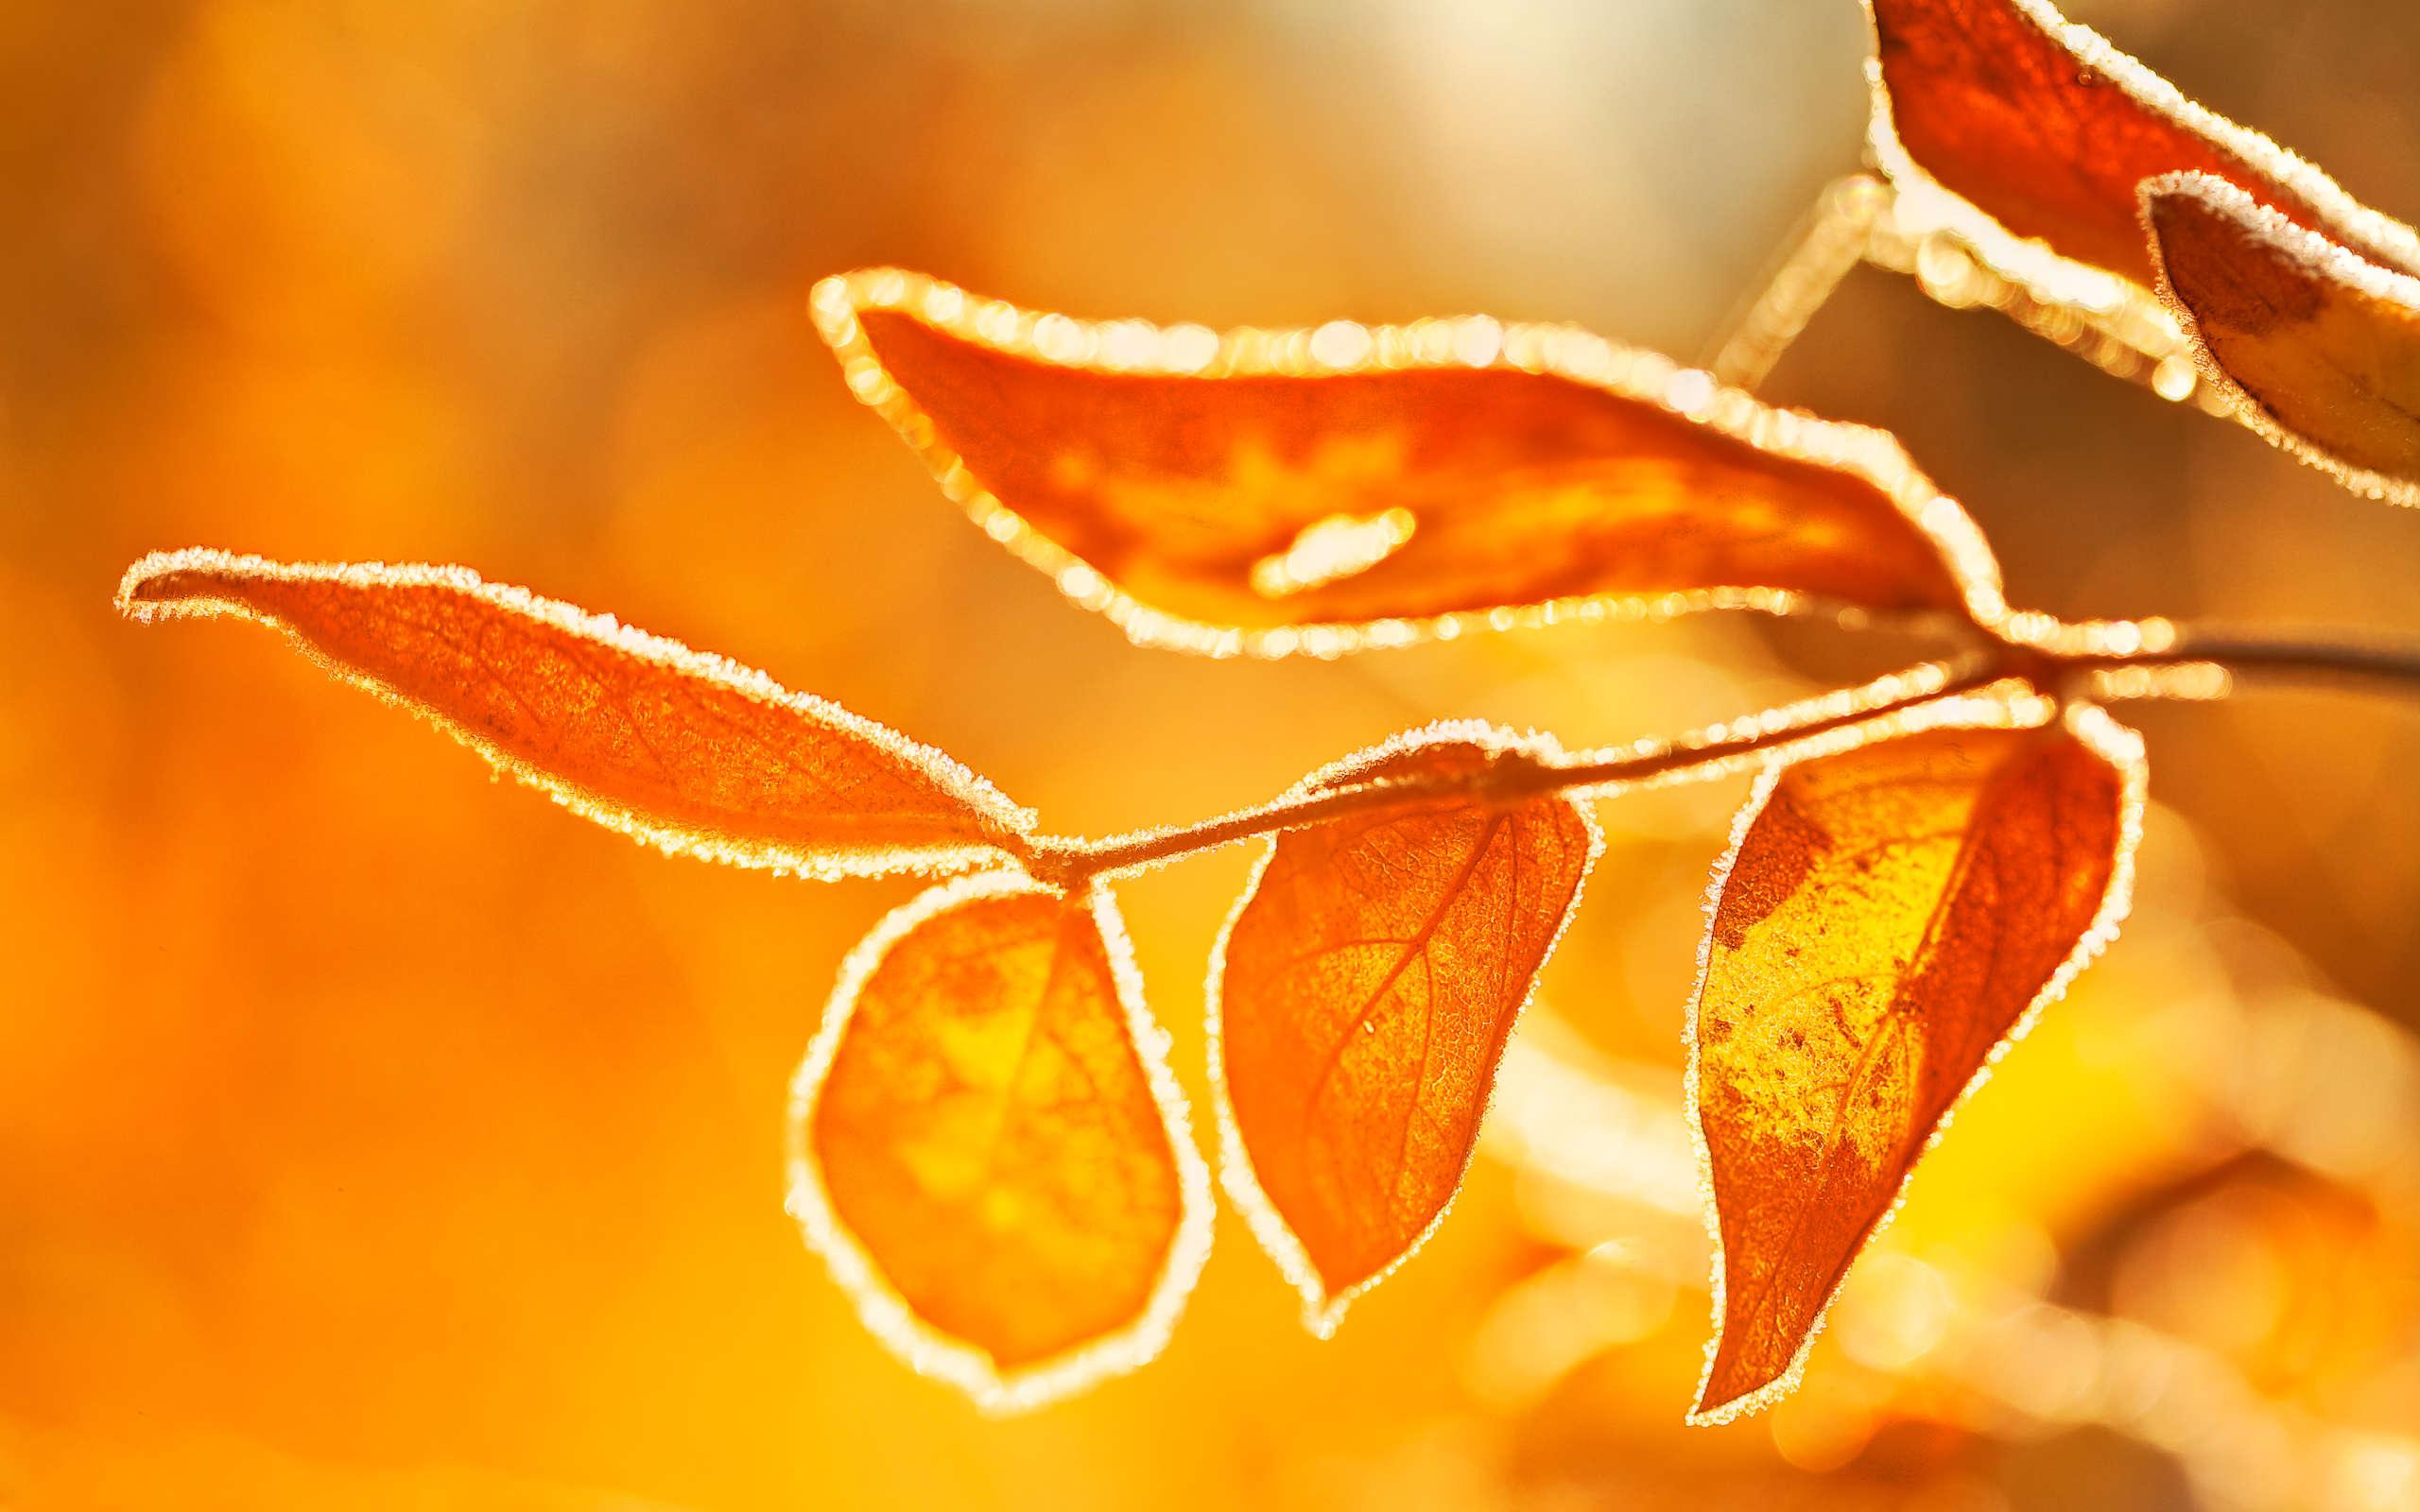 Fall Leaves Desktop Wallpaper Ubuntu 13 04 Winning Wallpapers Revealed Omg Ubuntu